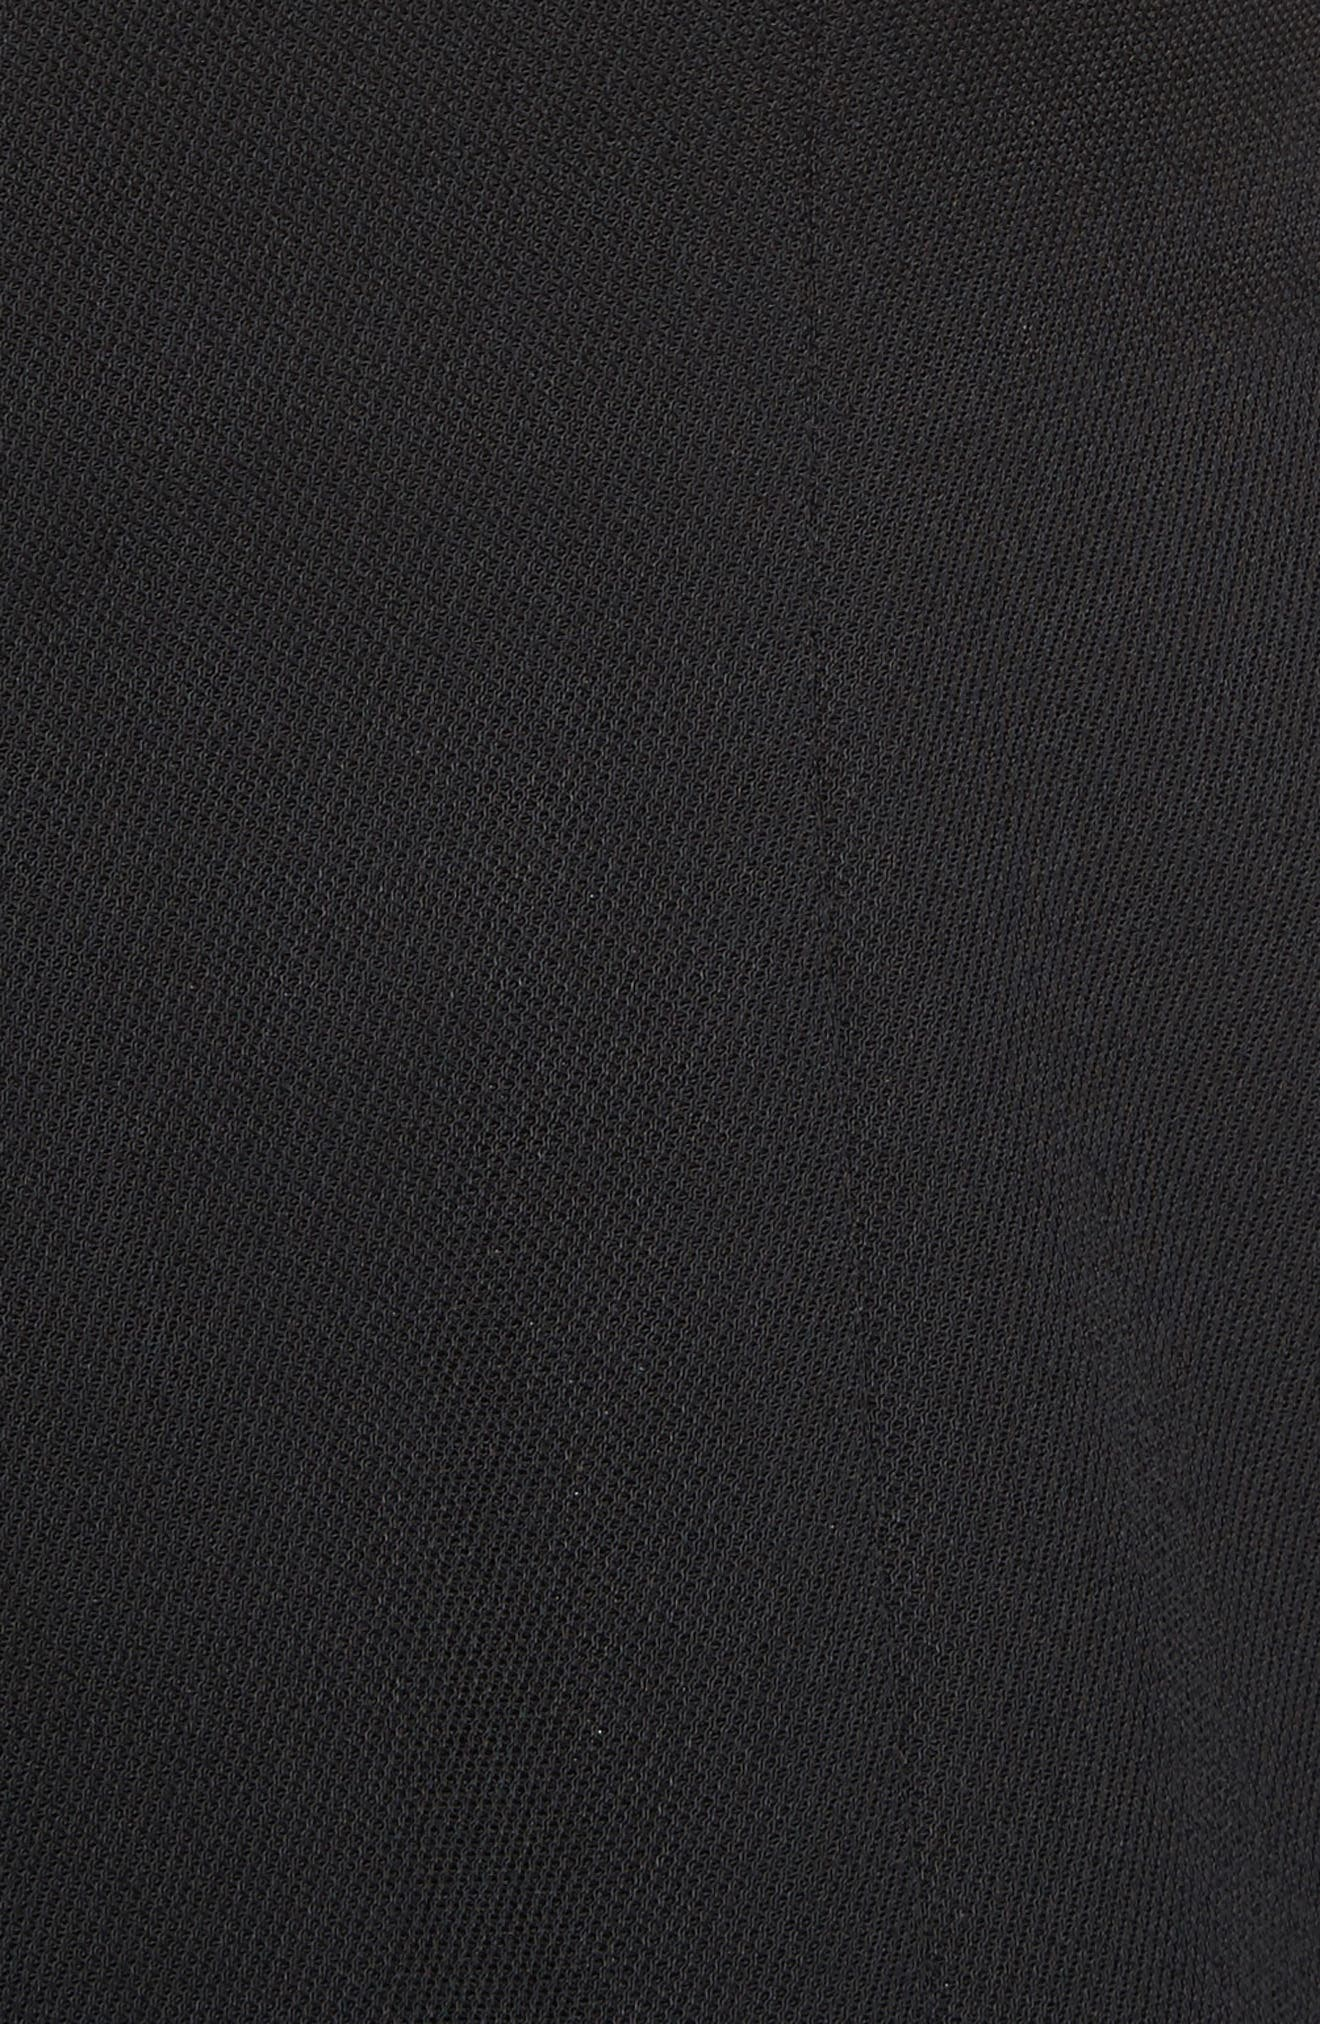 Mixed Media V-Neck Dress,                             Alternate thumbnail 5, color,                             001